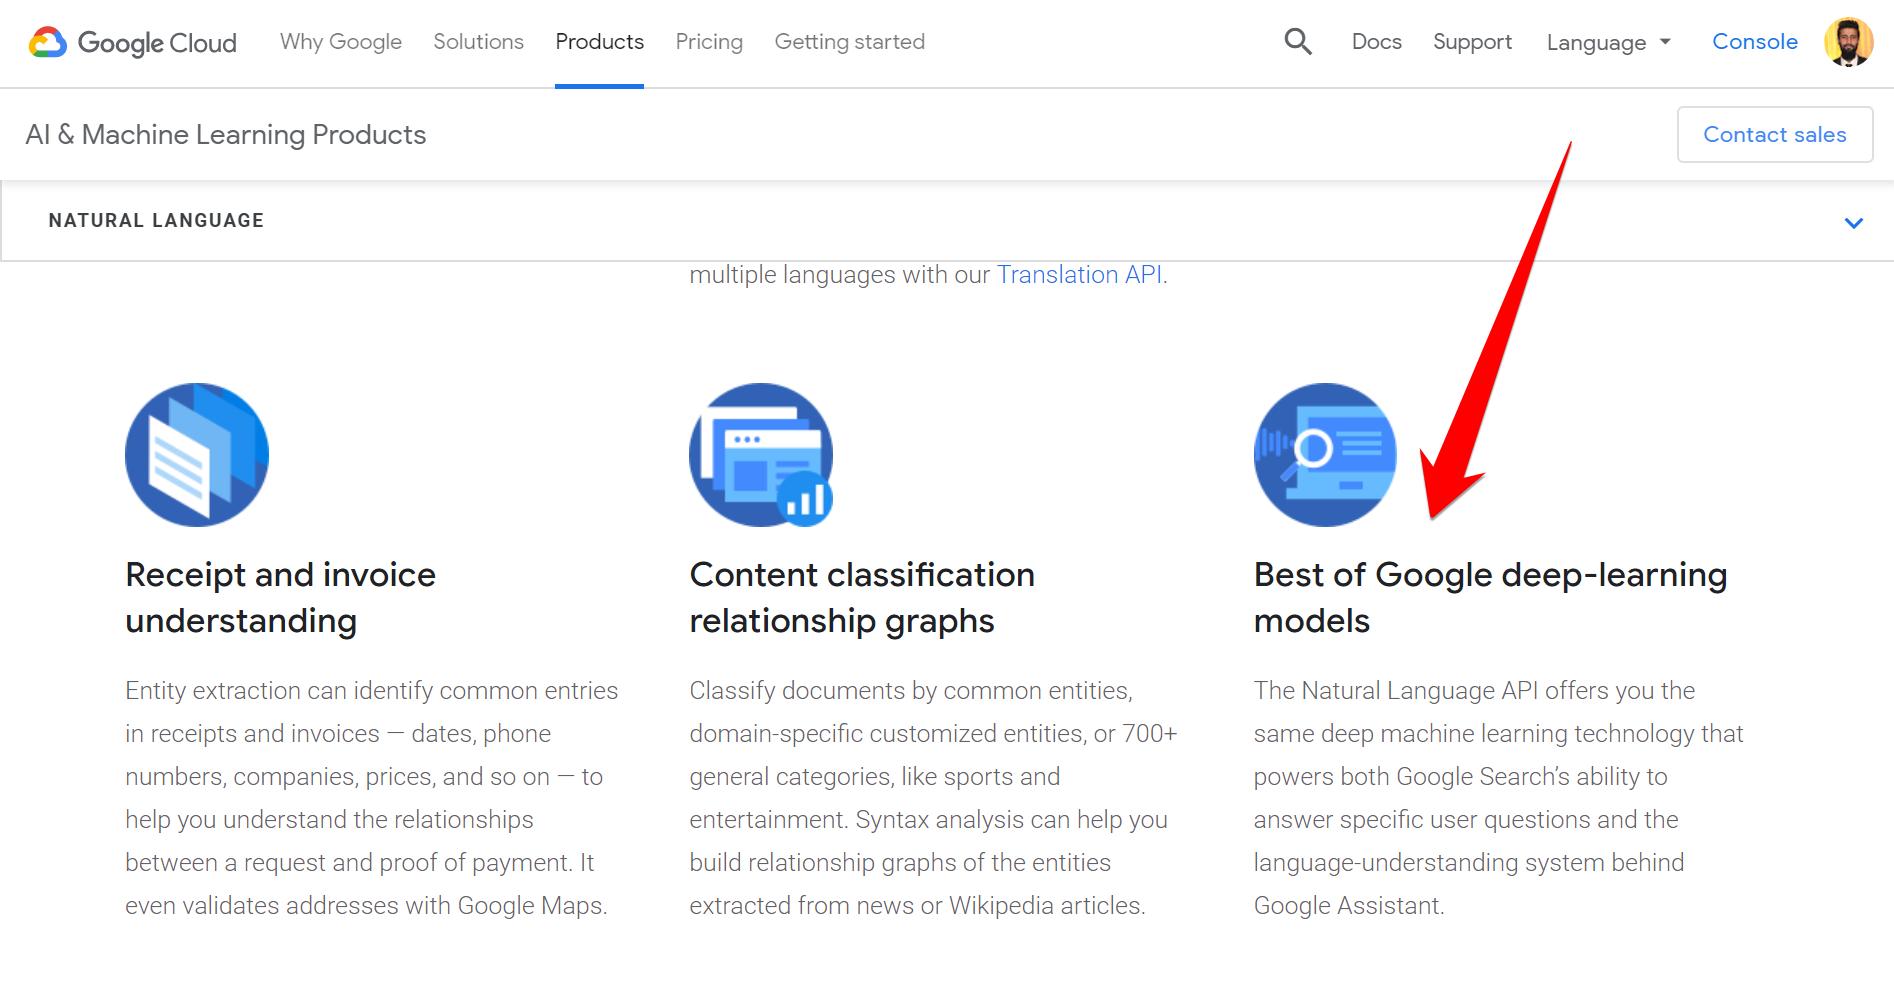 Best of Google deep-learning models screenshot